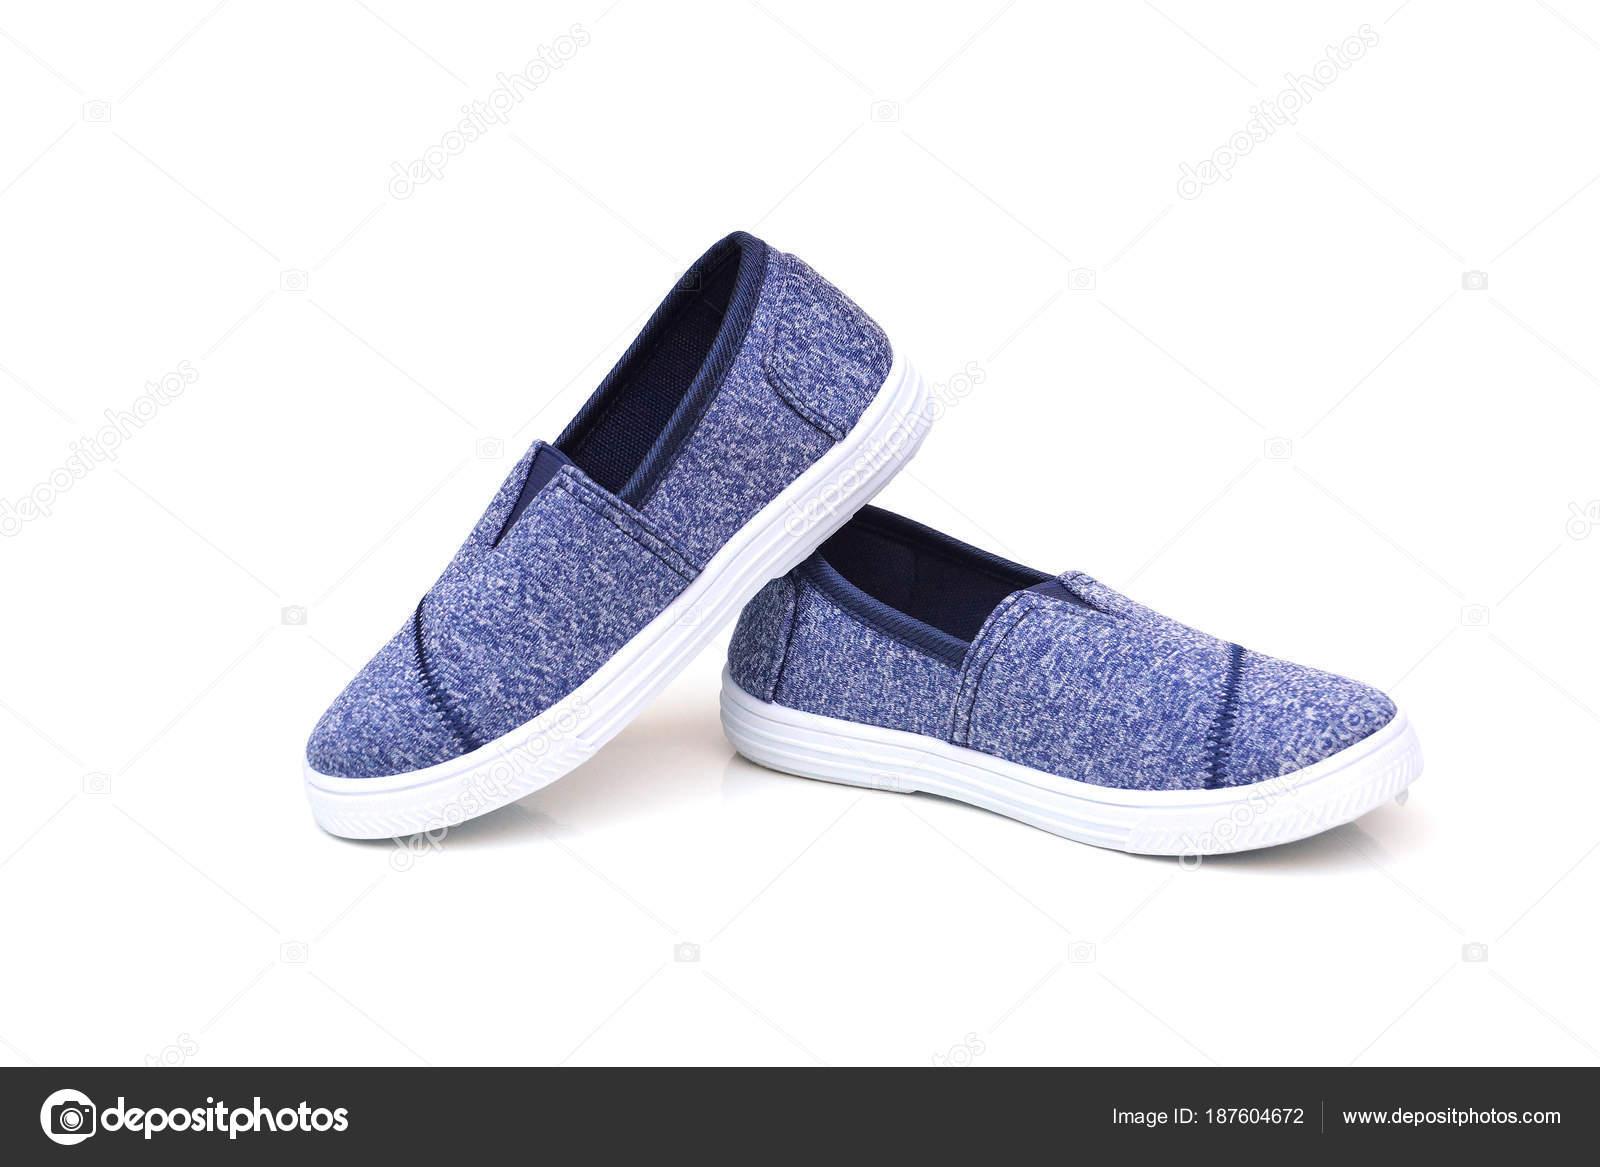 2a9a021e4c3 Ζαν Τζιν Παντοφλέ Παπούτσια Που Απομονώνονται Λευκό Φόντο ...